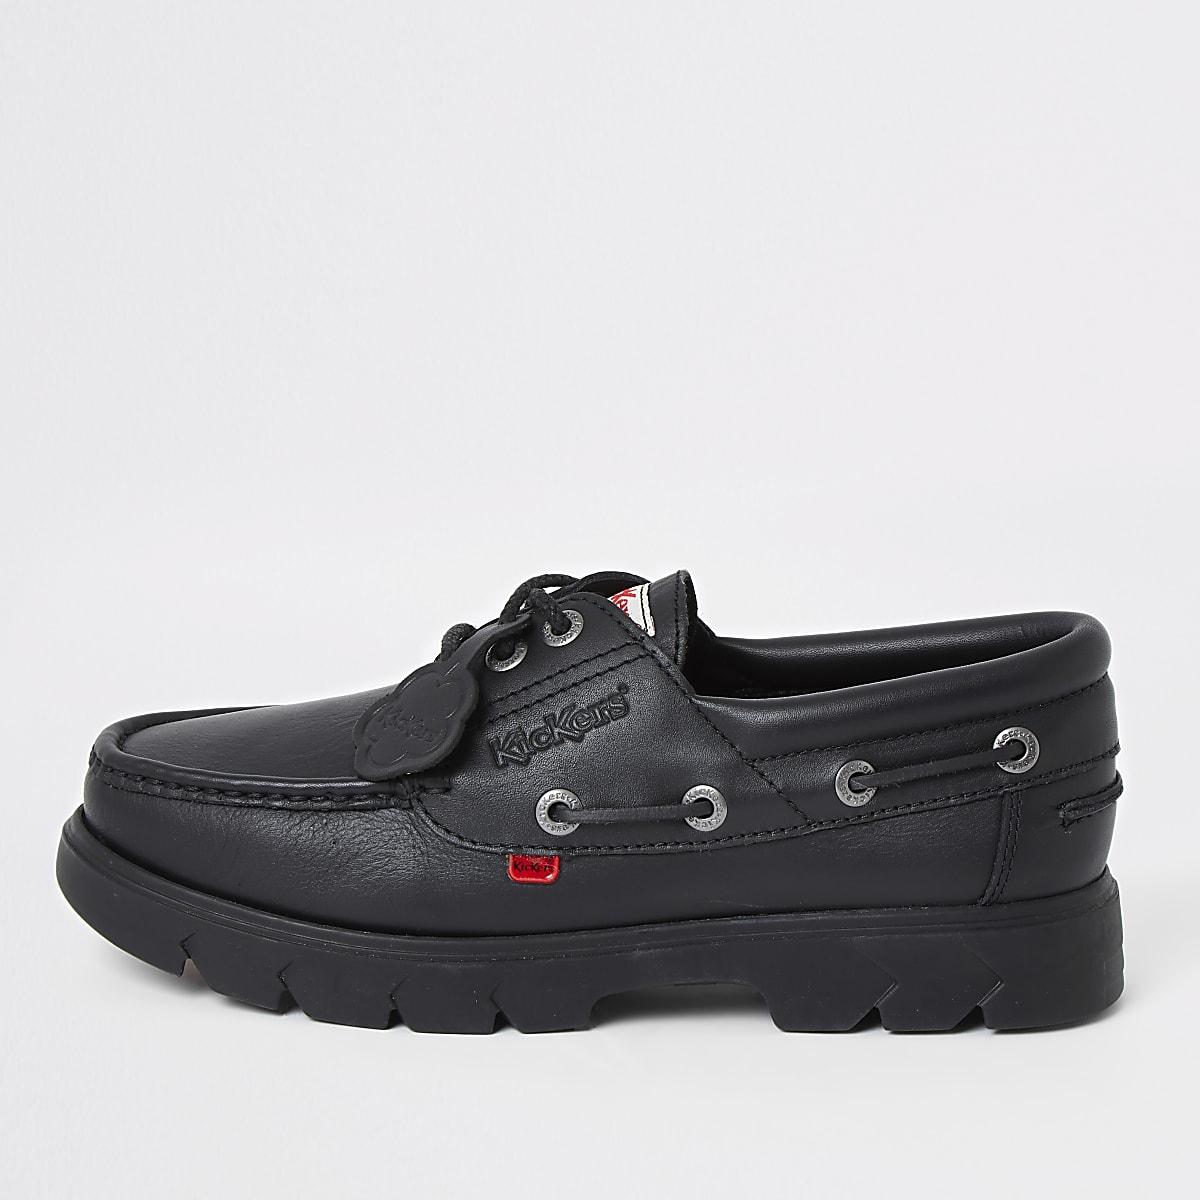 Kickers Lennon black leather boat shoes